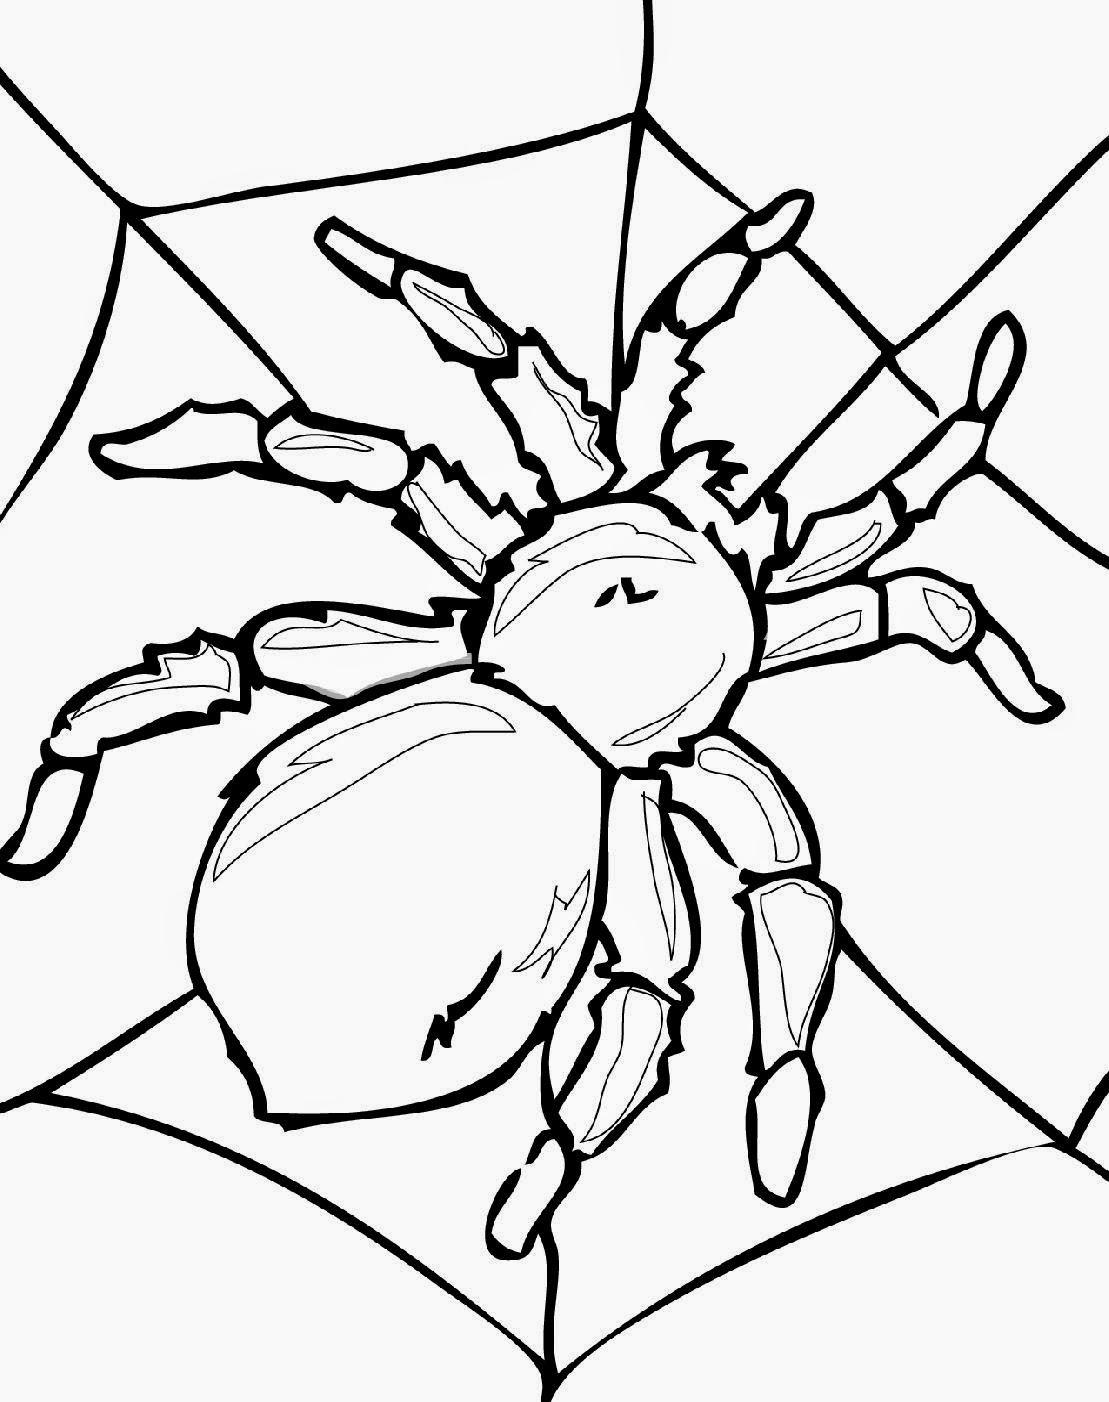 Bug Coloring Pages - Kidsuki